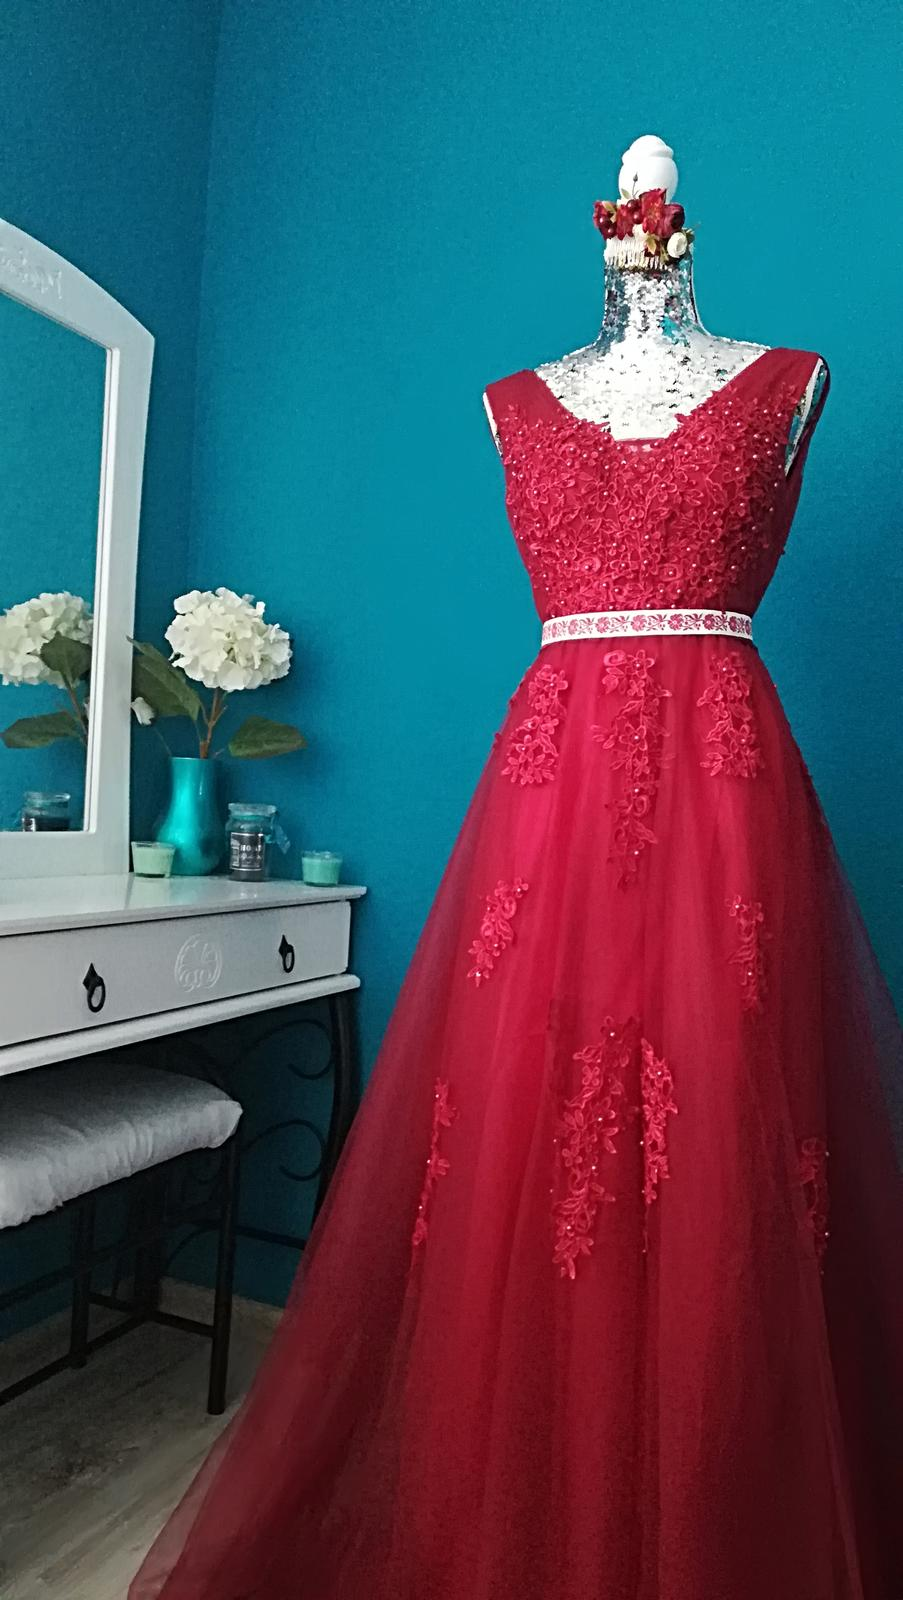 670461856a69 Luxusné spoločenské šaty